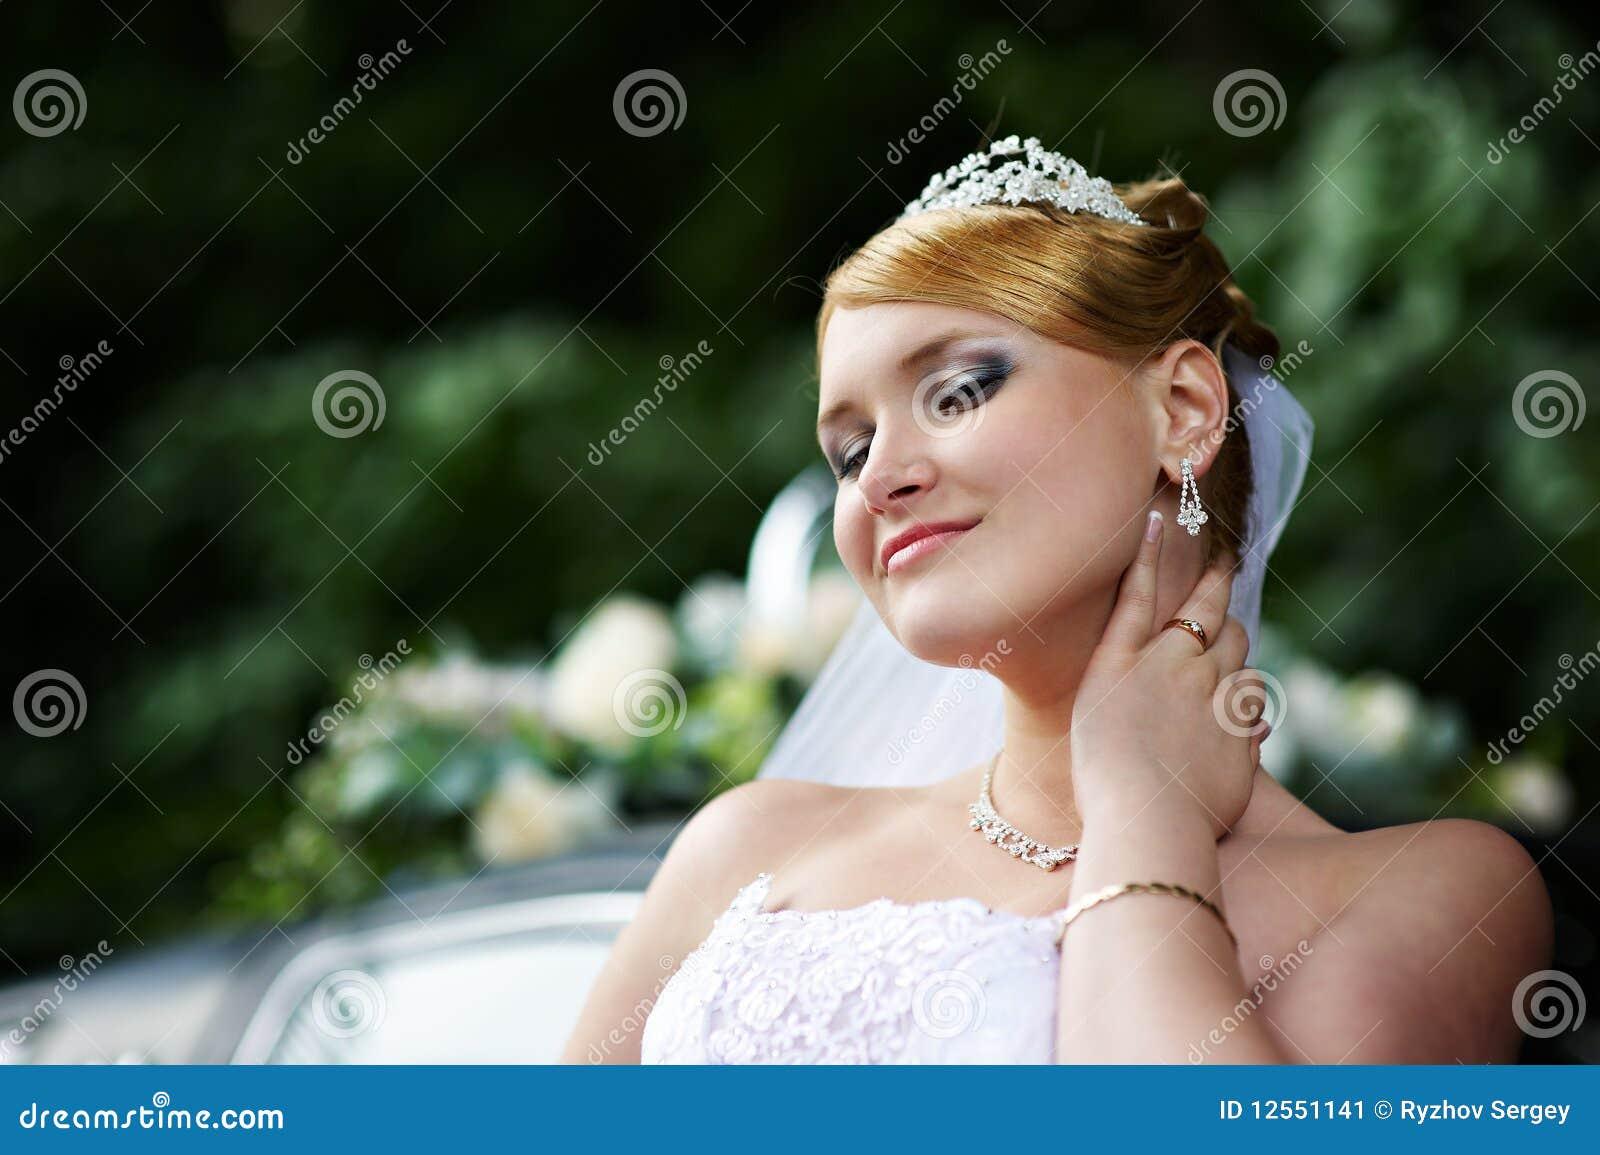 Luxury Bride With A Haughty Look In Wedding Dress Stock ...